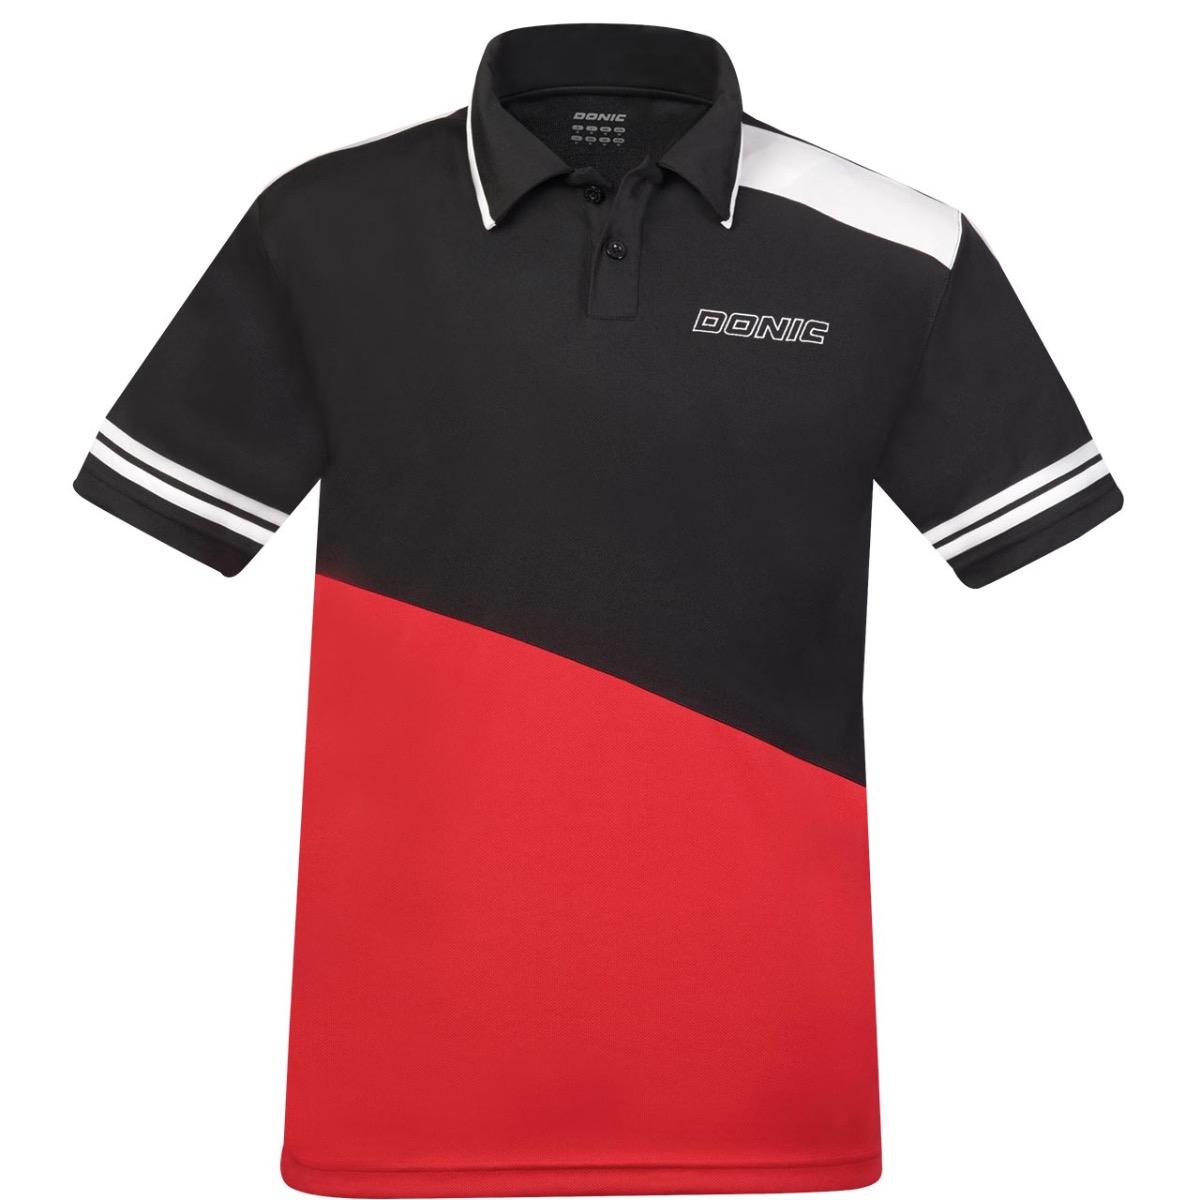 Donic Prime Red/Black